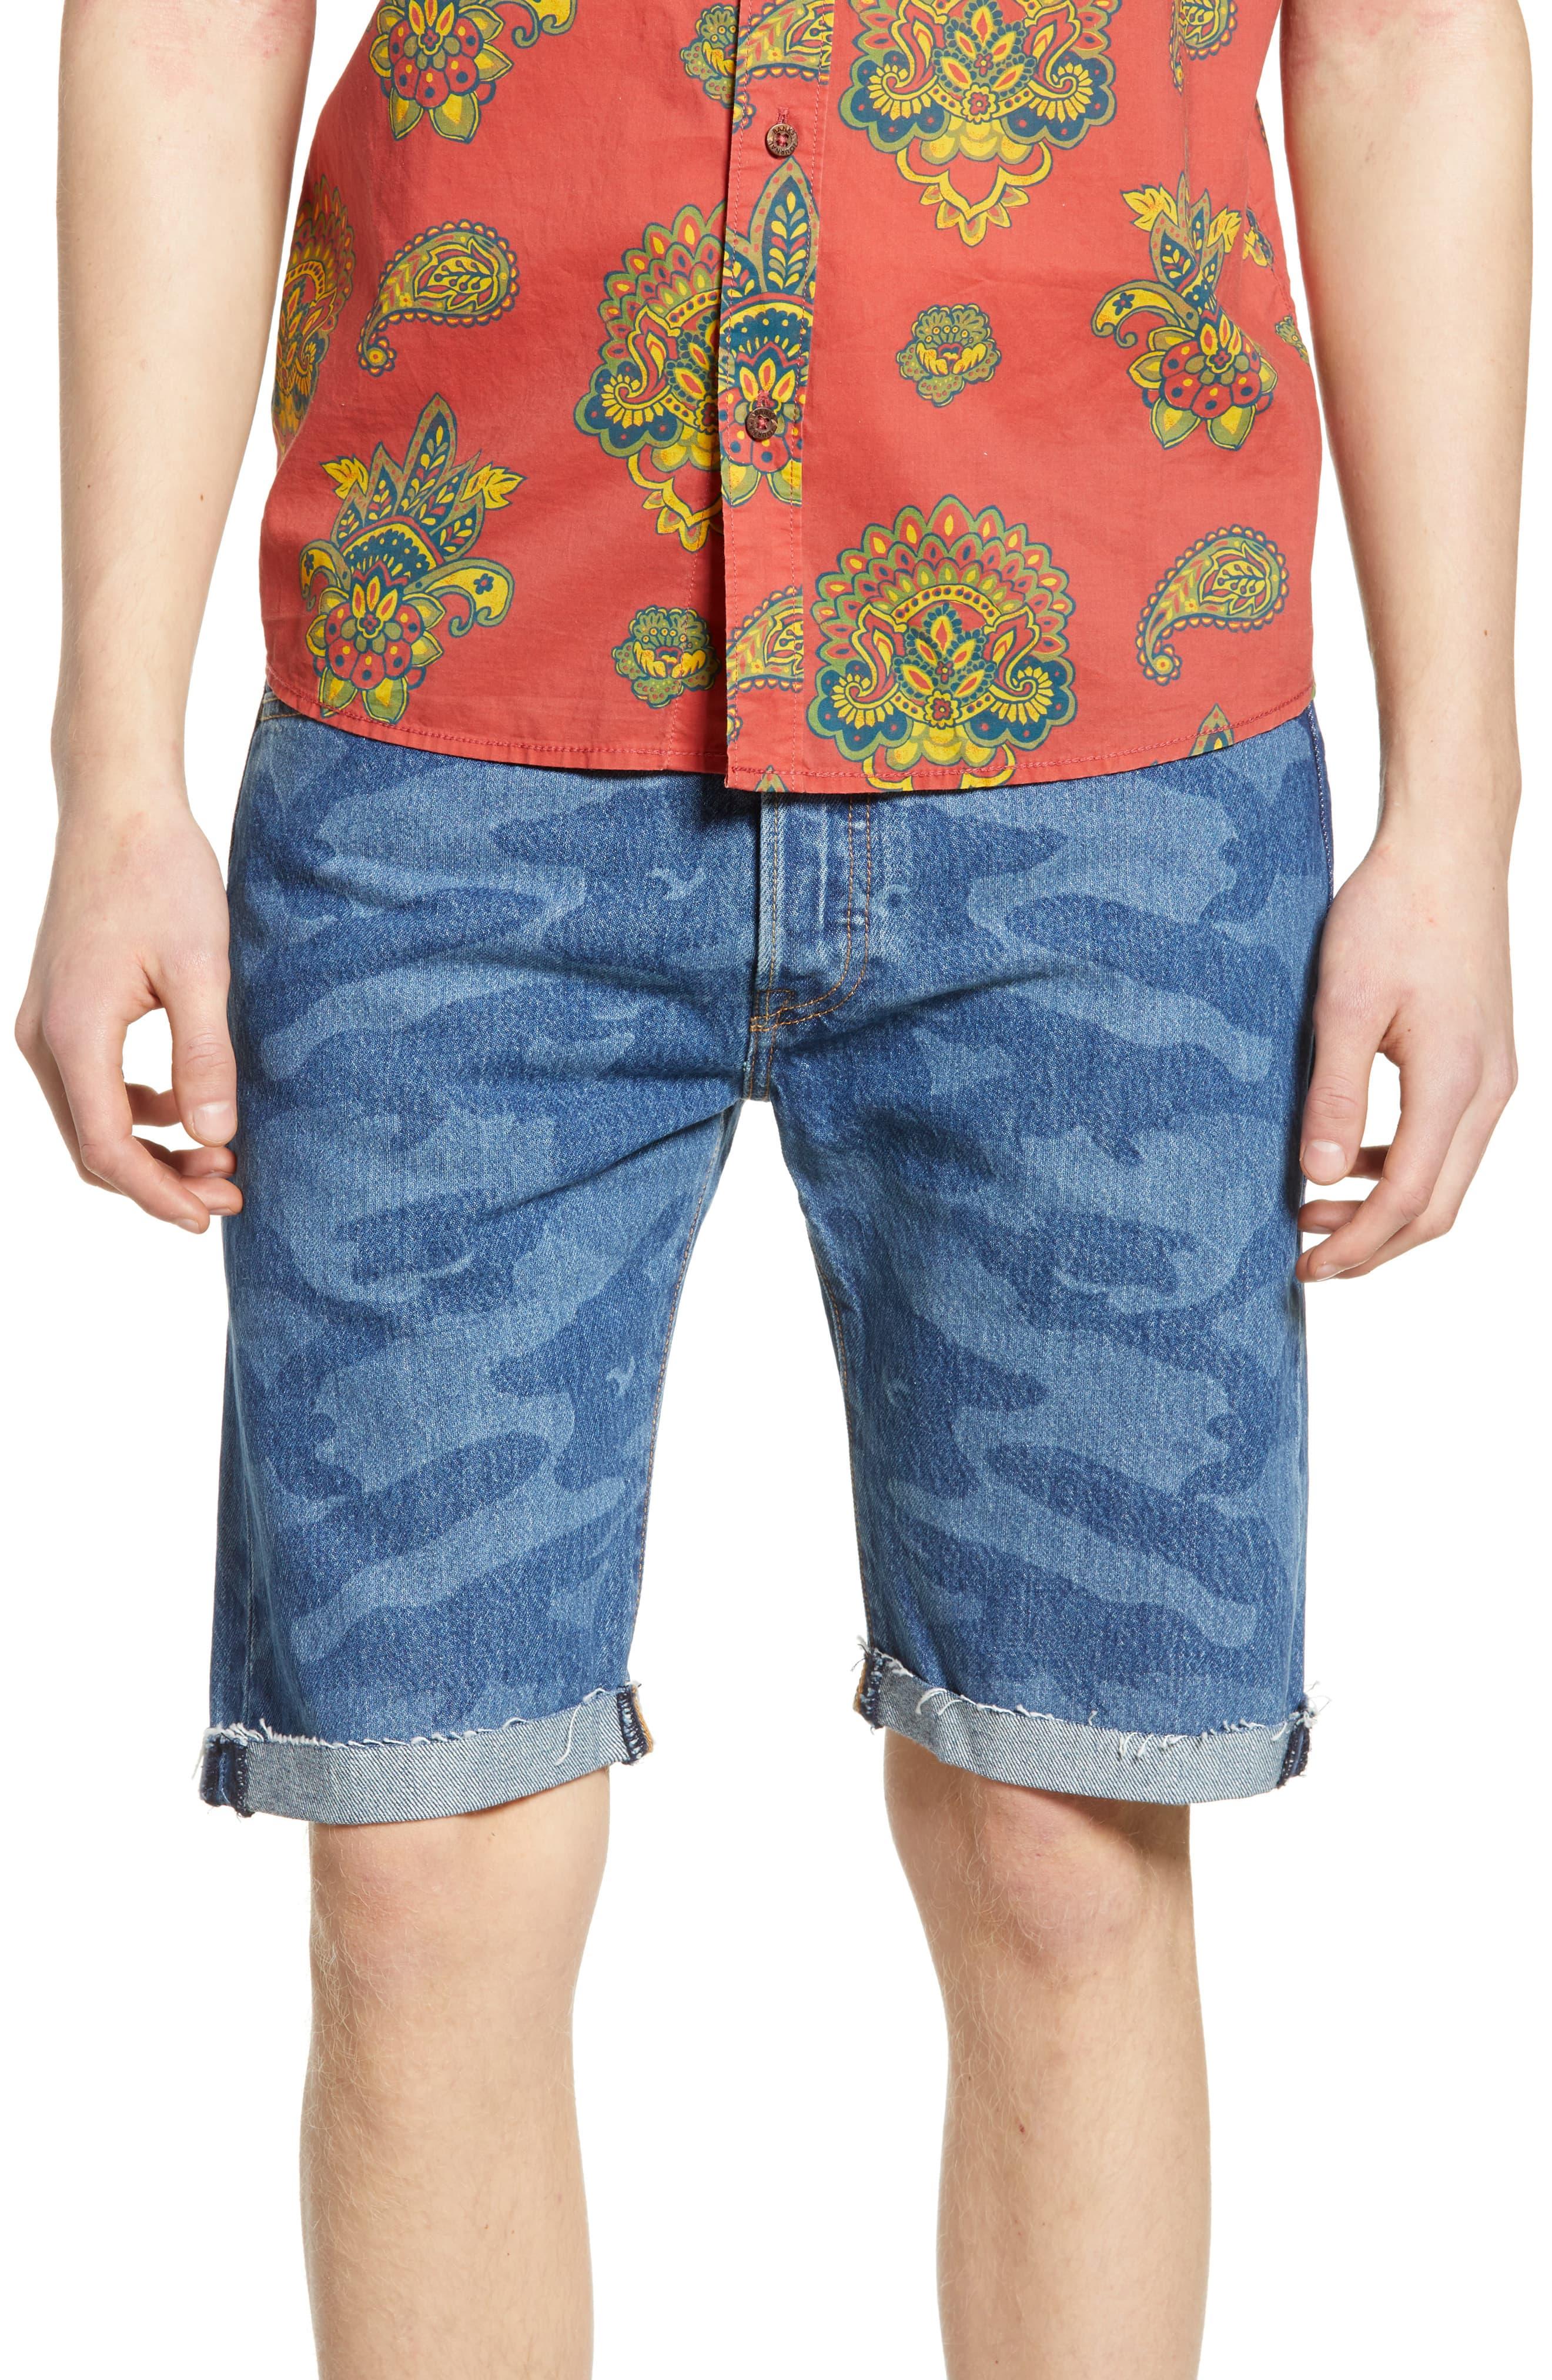 31a77ec9 Men's Levi's 501 Cut Off Denim Shorts, Size 29 – Blue   The Fashionisto